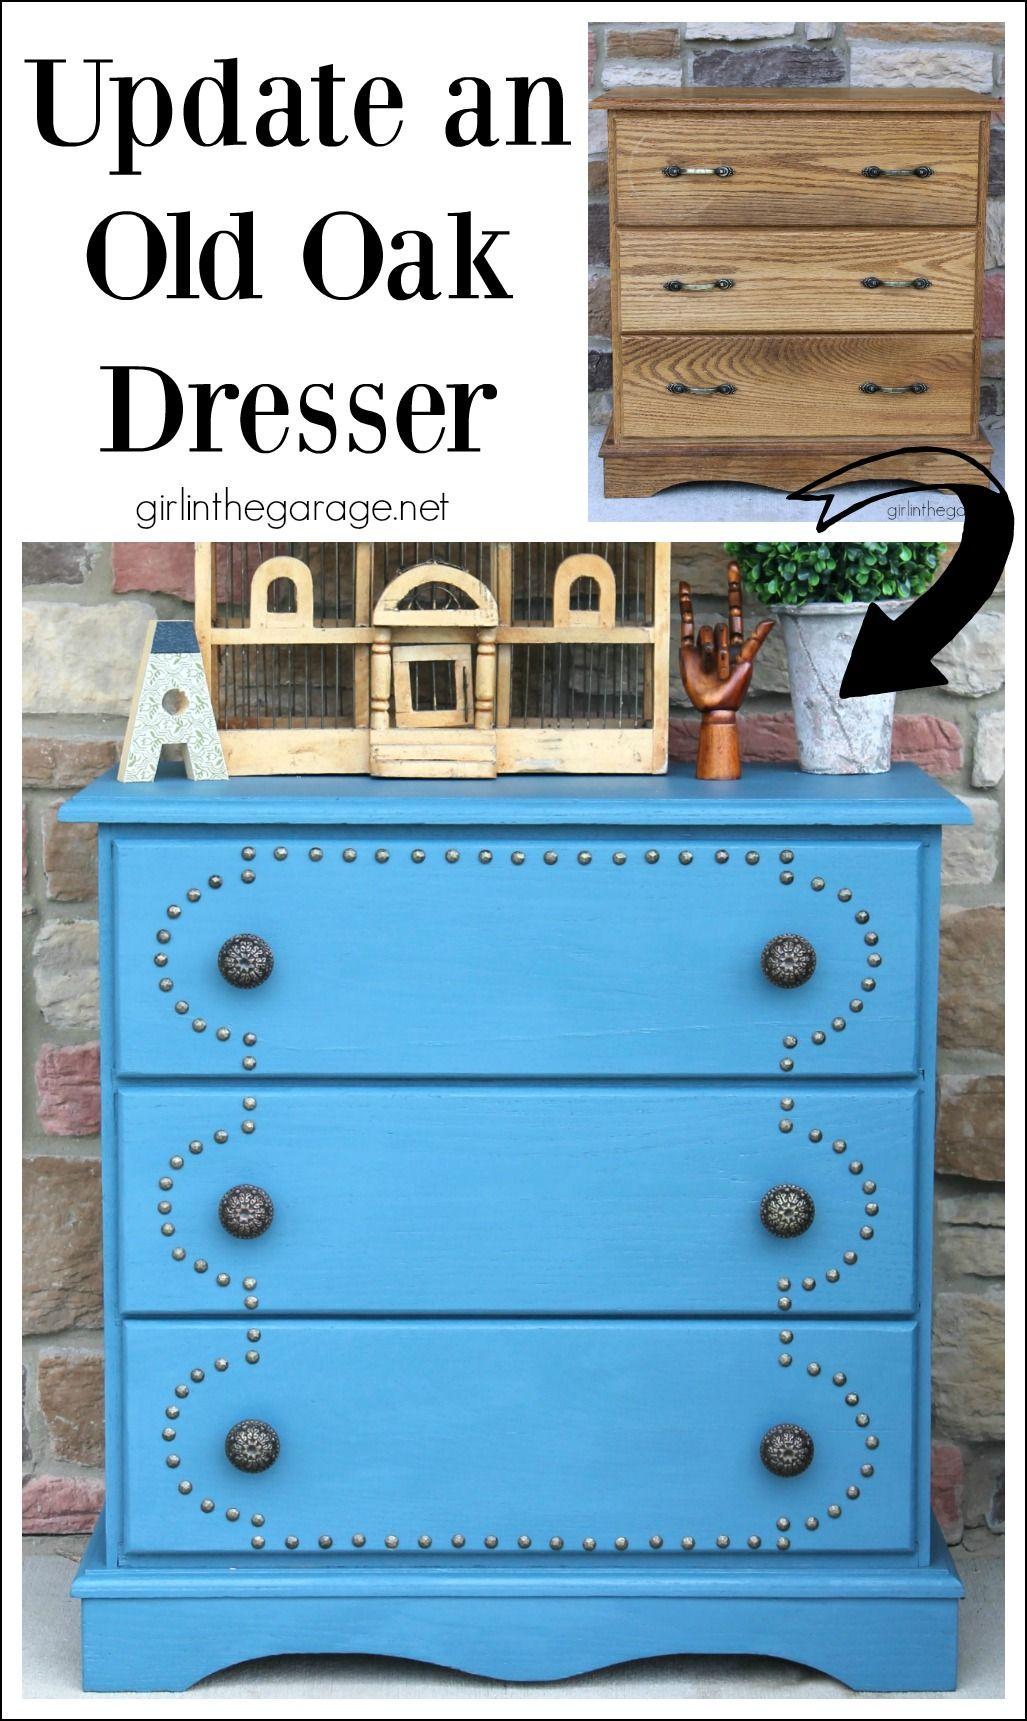 How To Update An Old Oak Dresser   Girlinthegarage.net